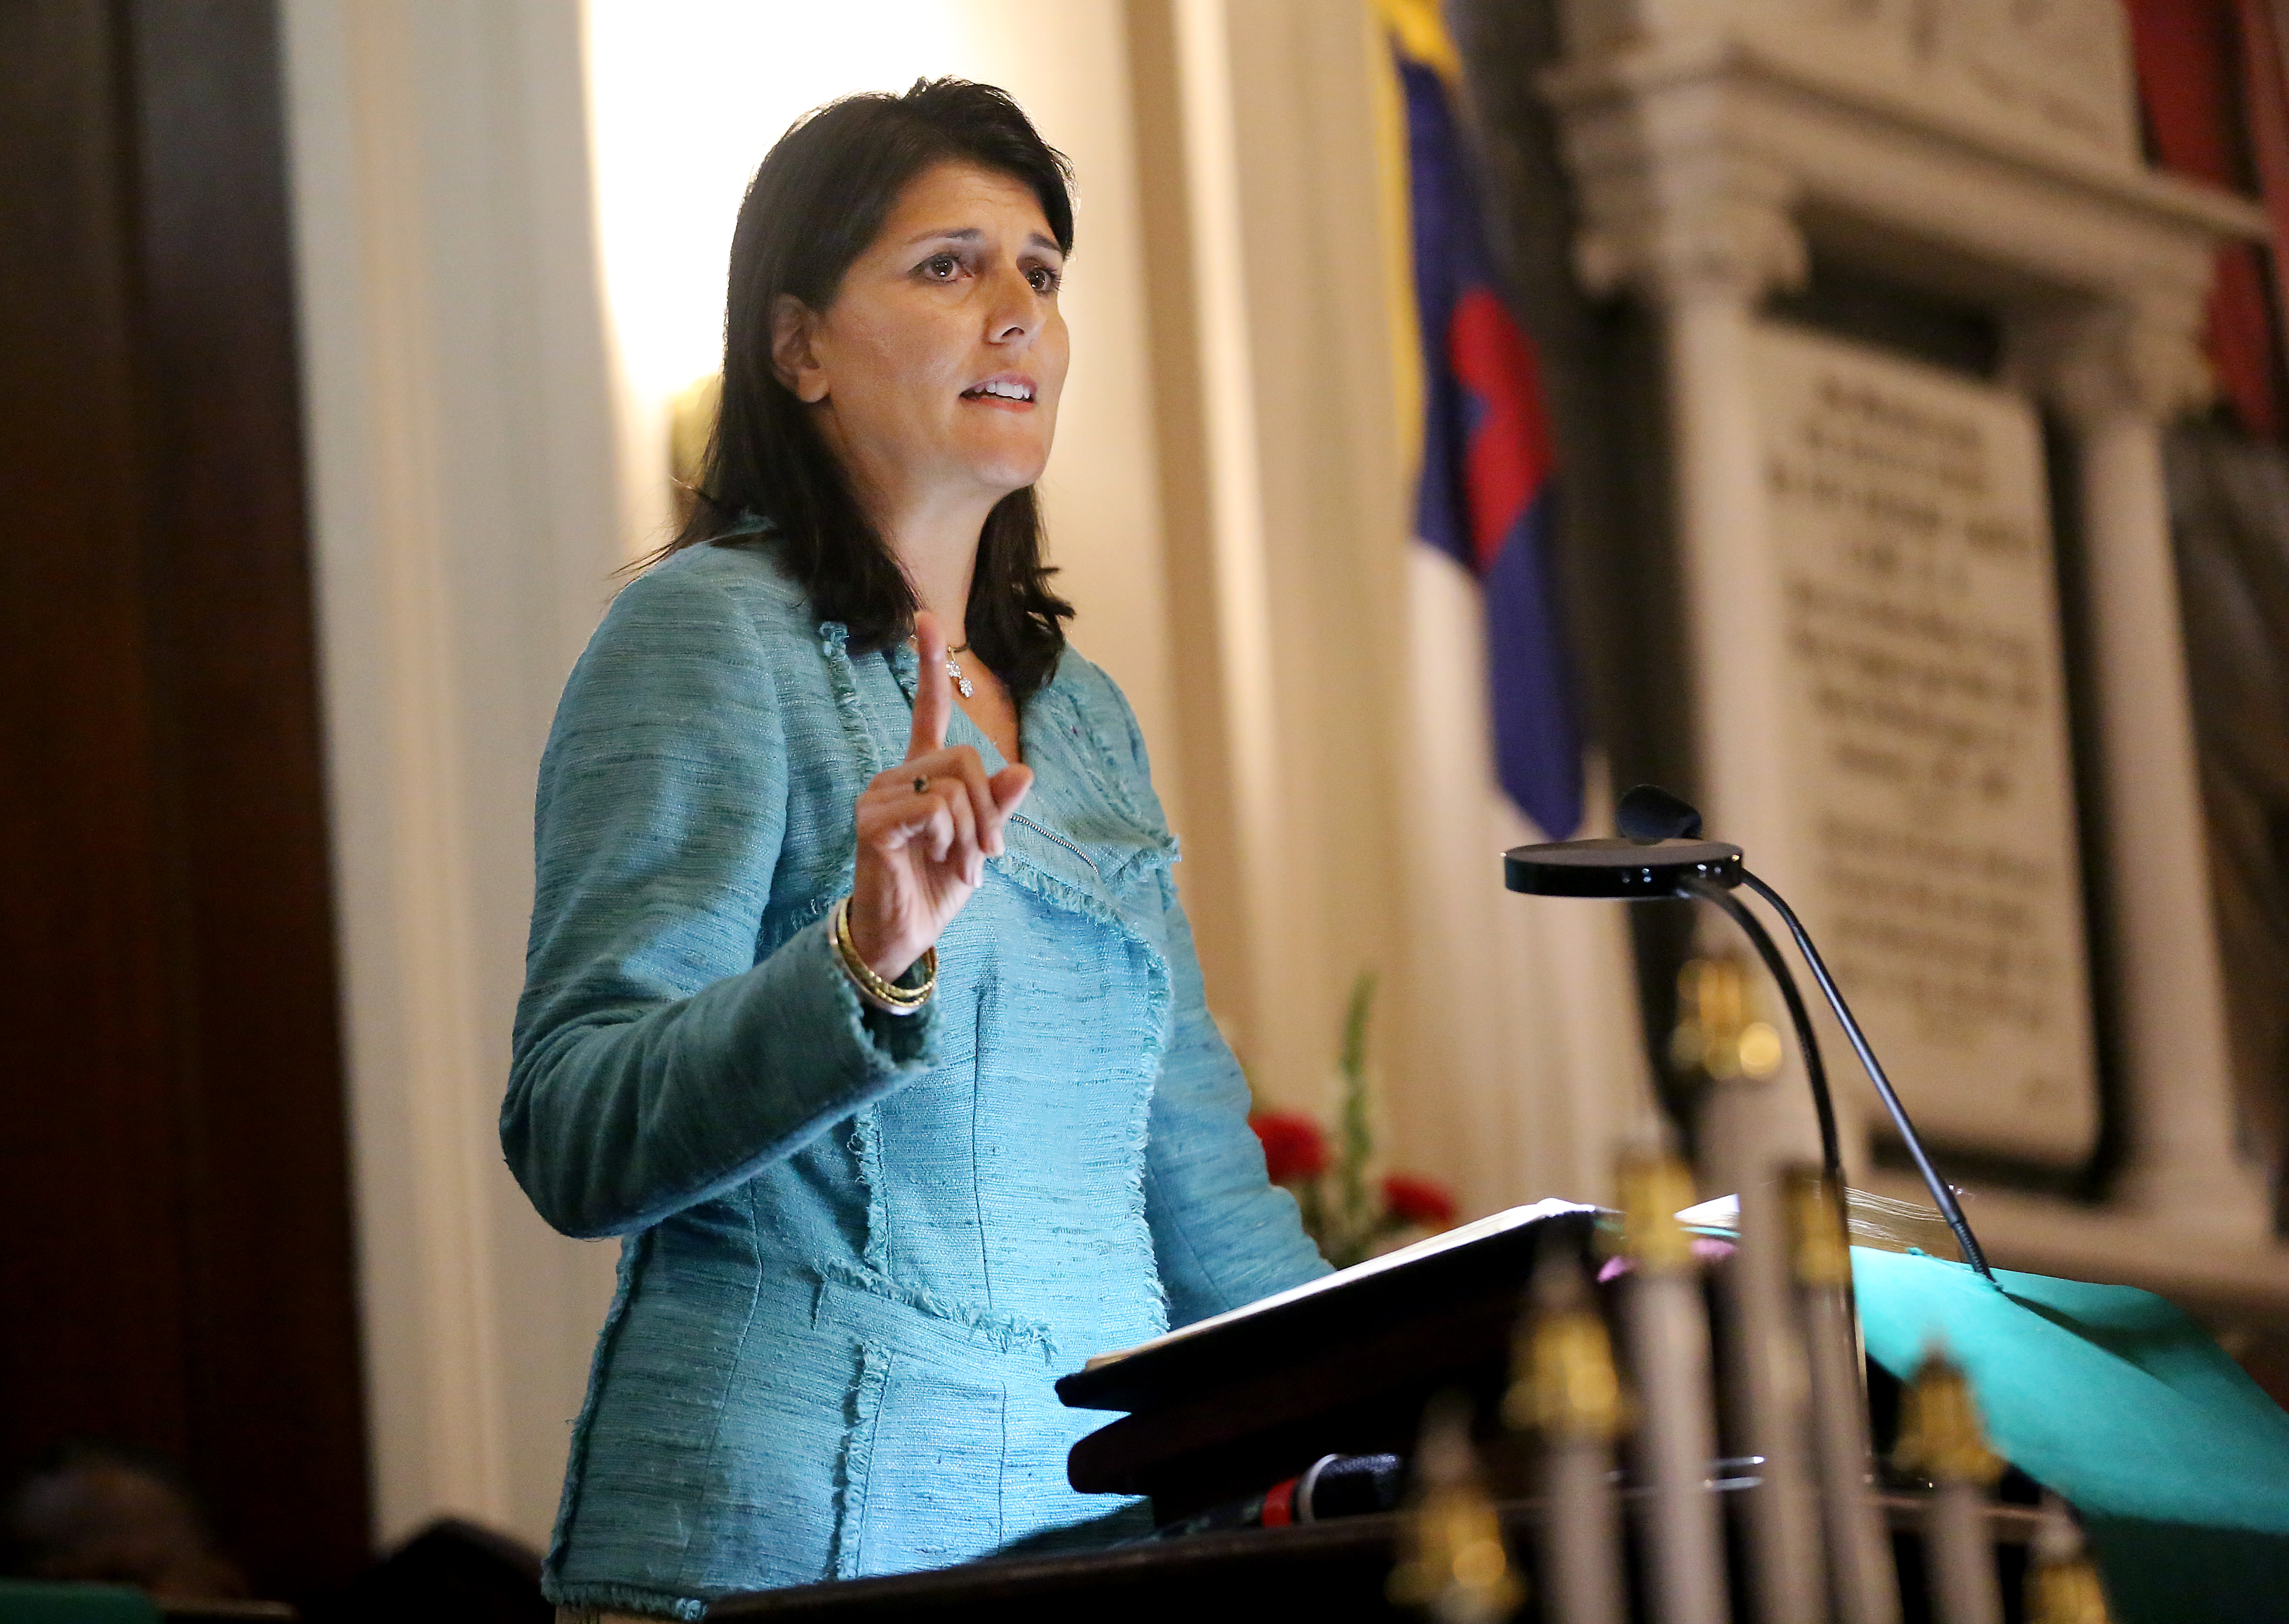 S C  froze death penalty amid drug shortage - The Boston Globe